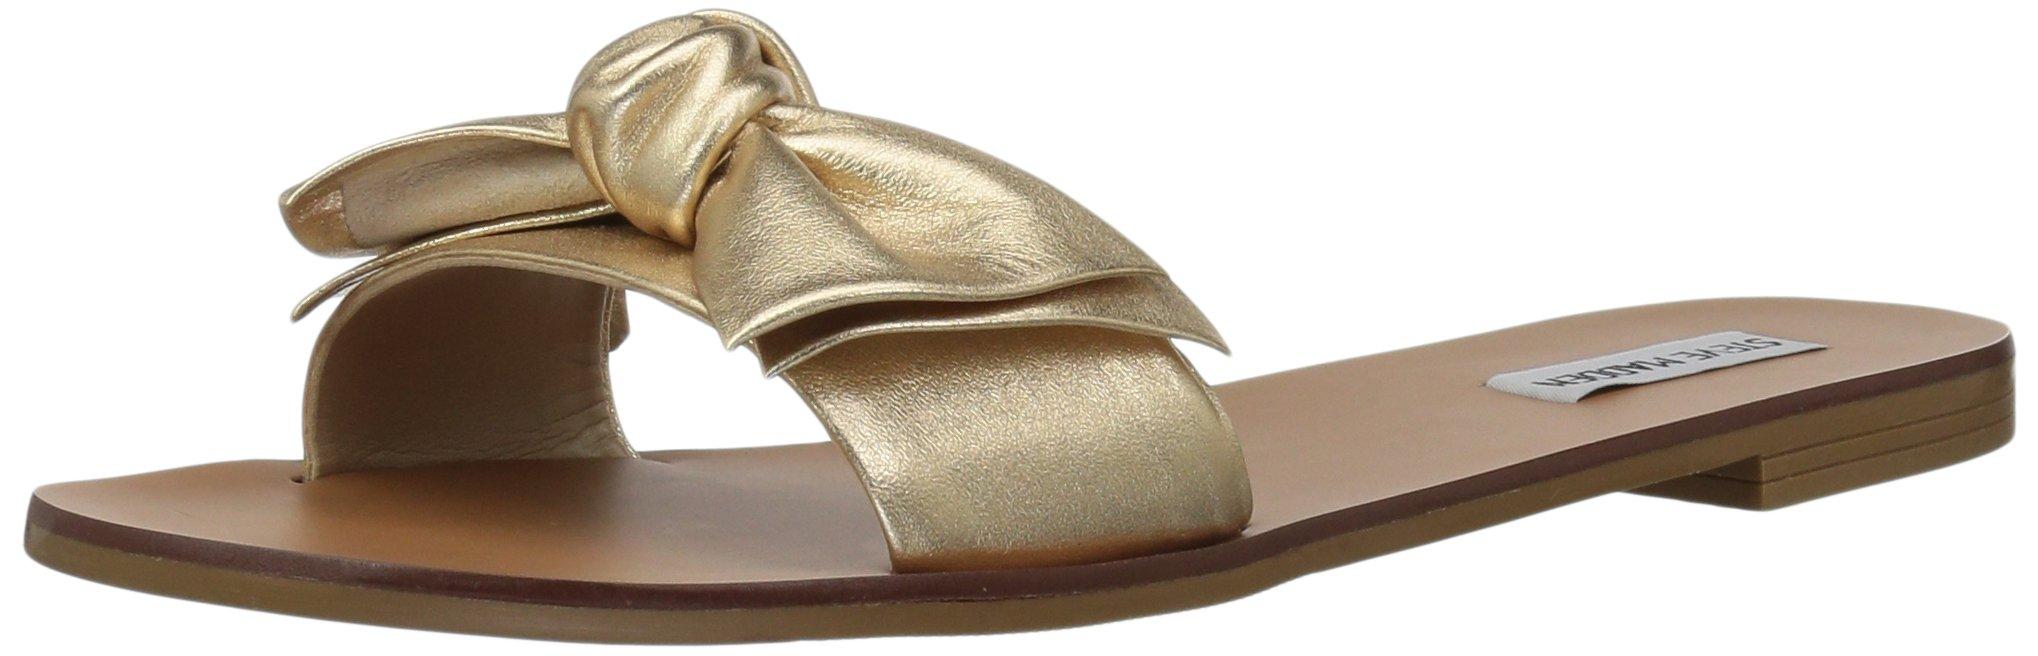 Steve Madden Women's Knotss Flat Sandal, Gold Leather, 7.5 M US